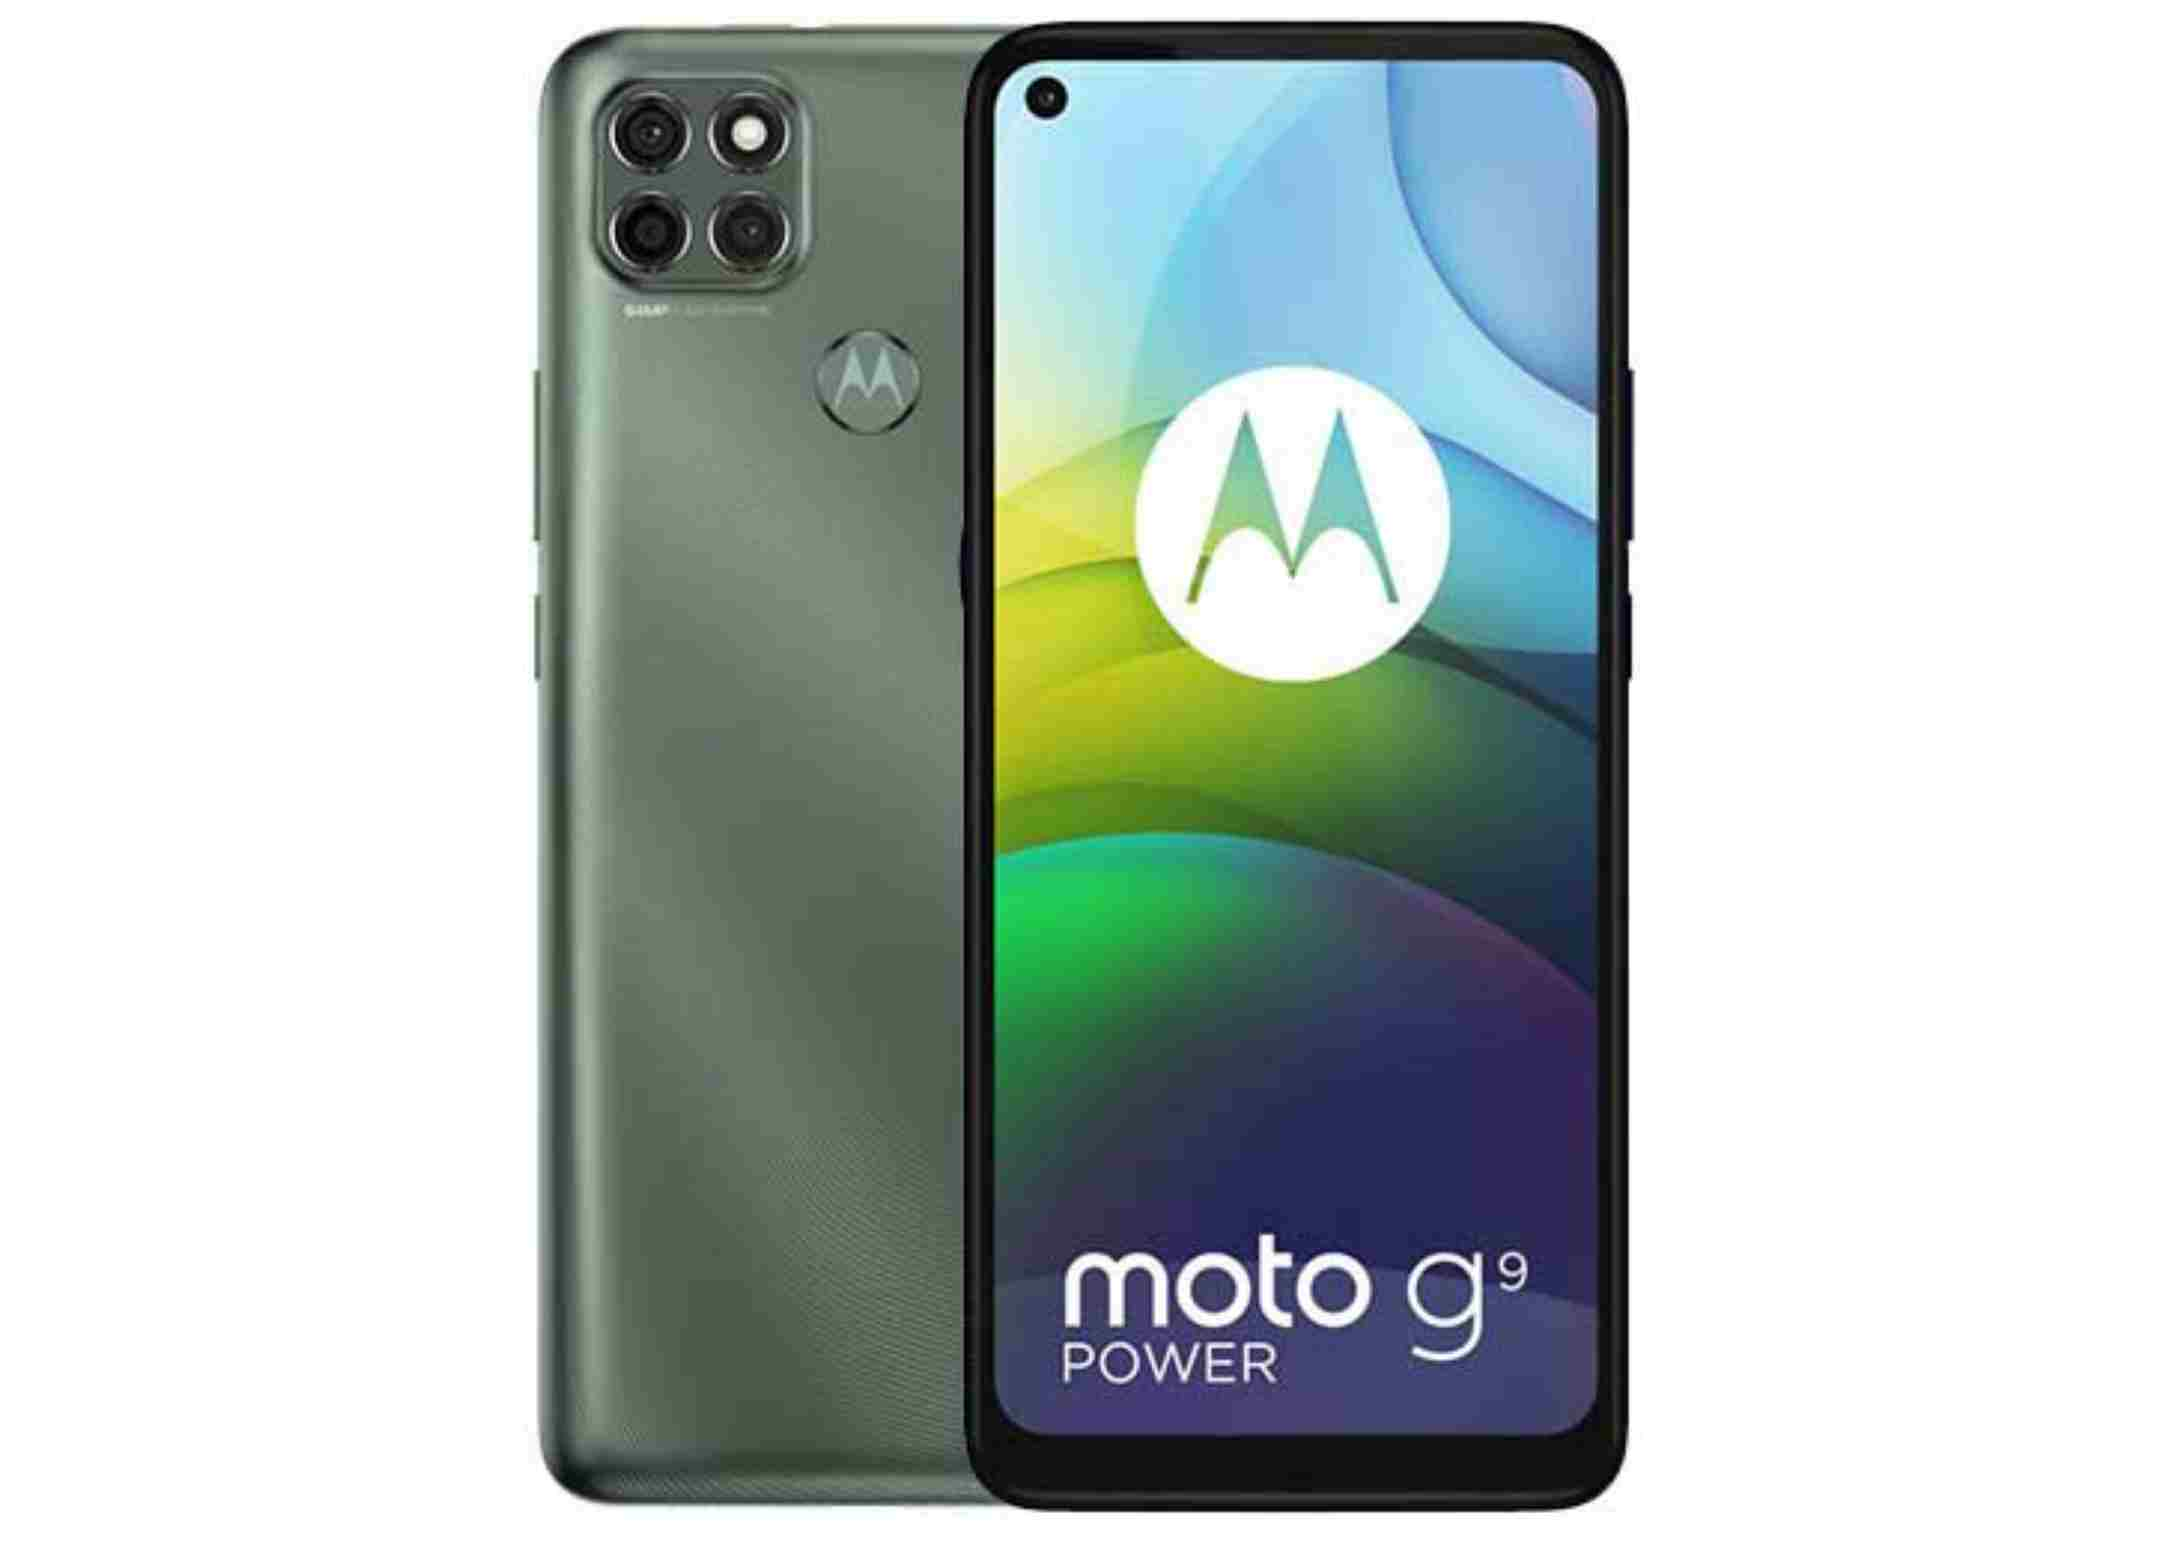 Motorola Moto G9 Power Lite price, release date, specs and latest news - My Mobiles